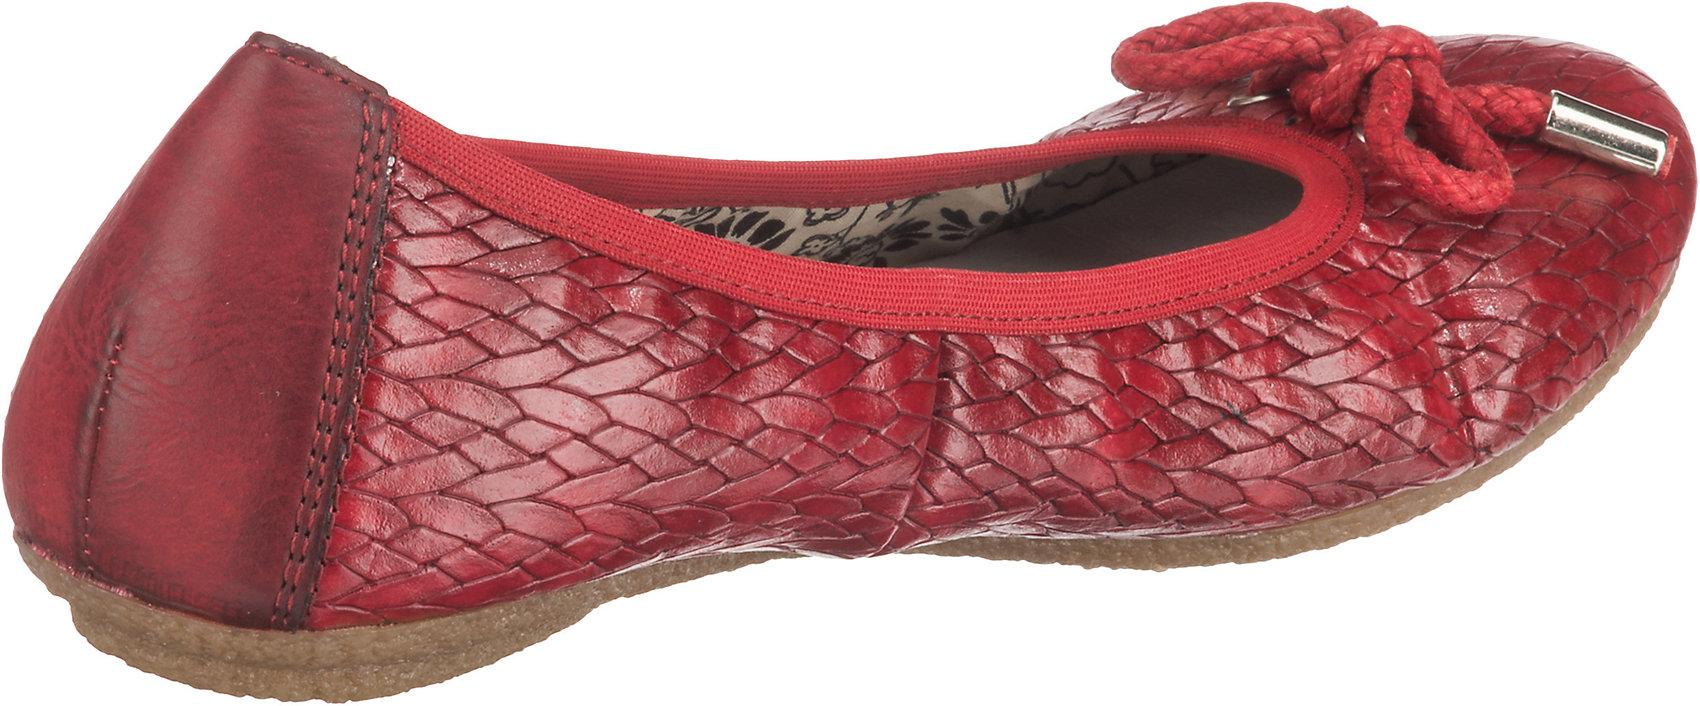 Neu rieker Ballerinas 10625657 für Damen rot